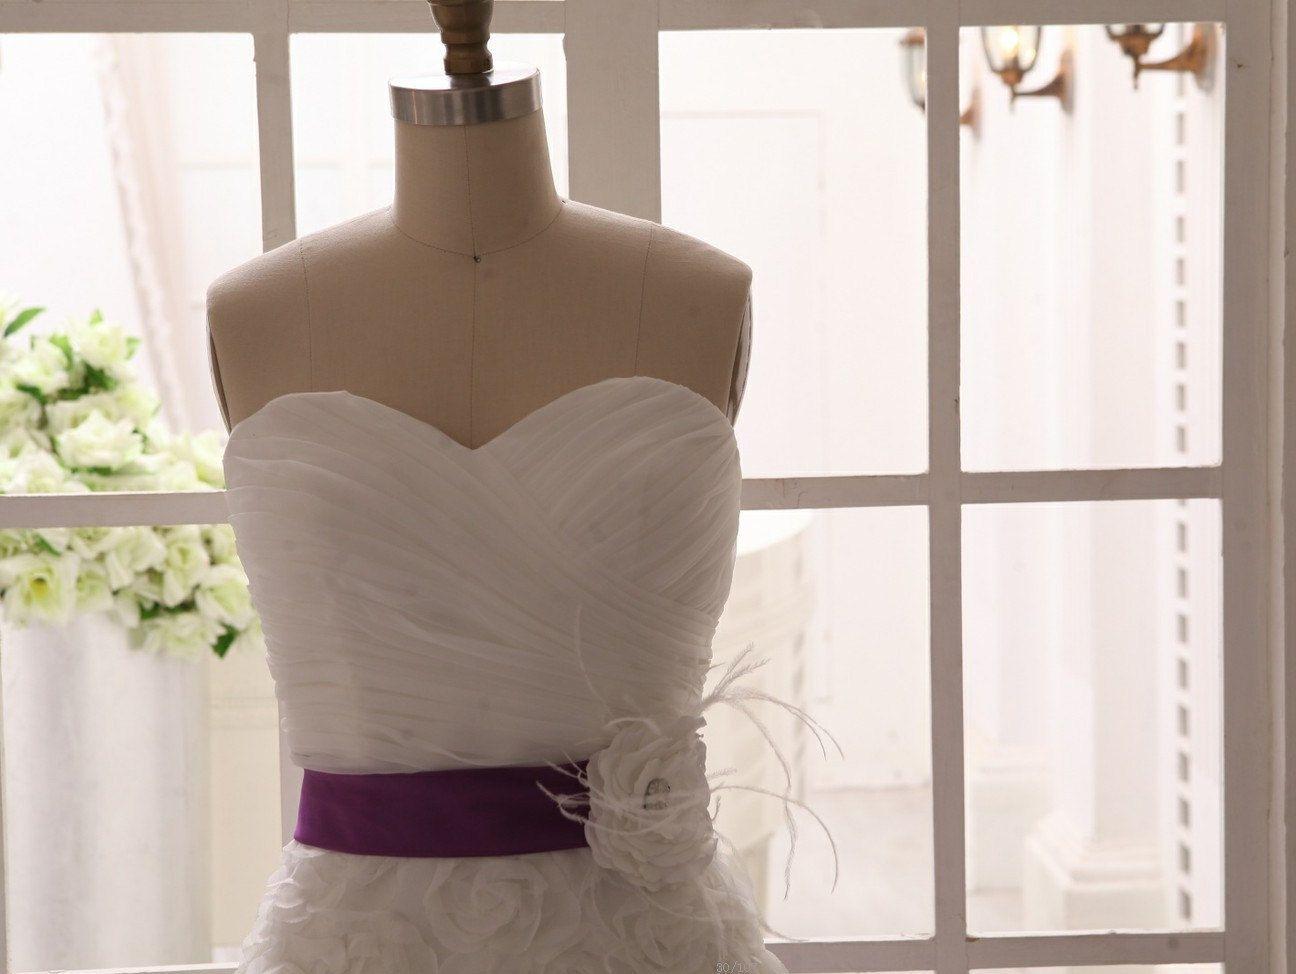 Strapless Organza 3D Rosette Flower Wedding Dress Bridesmaid Dress Knee Length Short Dress with flower sash by misdress on Etsy https://www.etsy.com/listing/155945908/strapless-organza-3d-rosette-flower